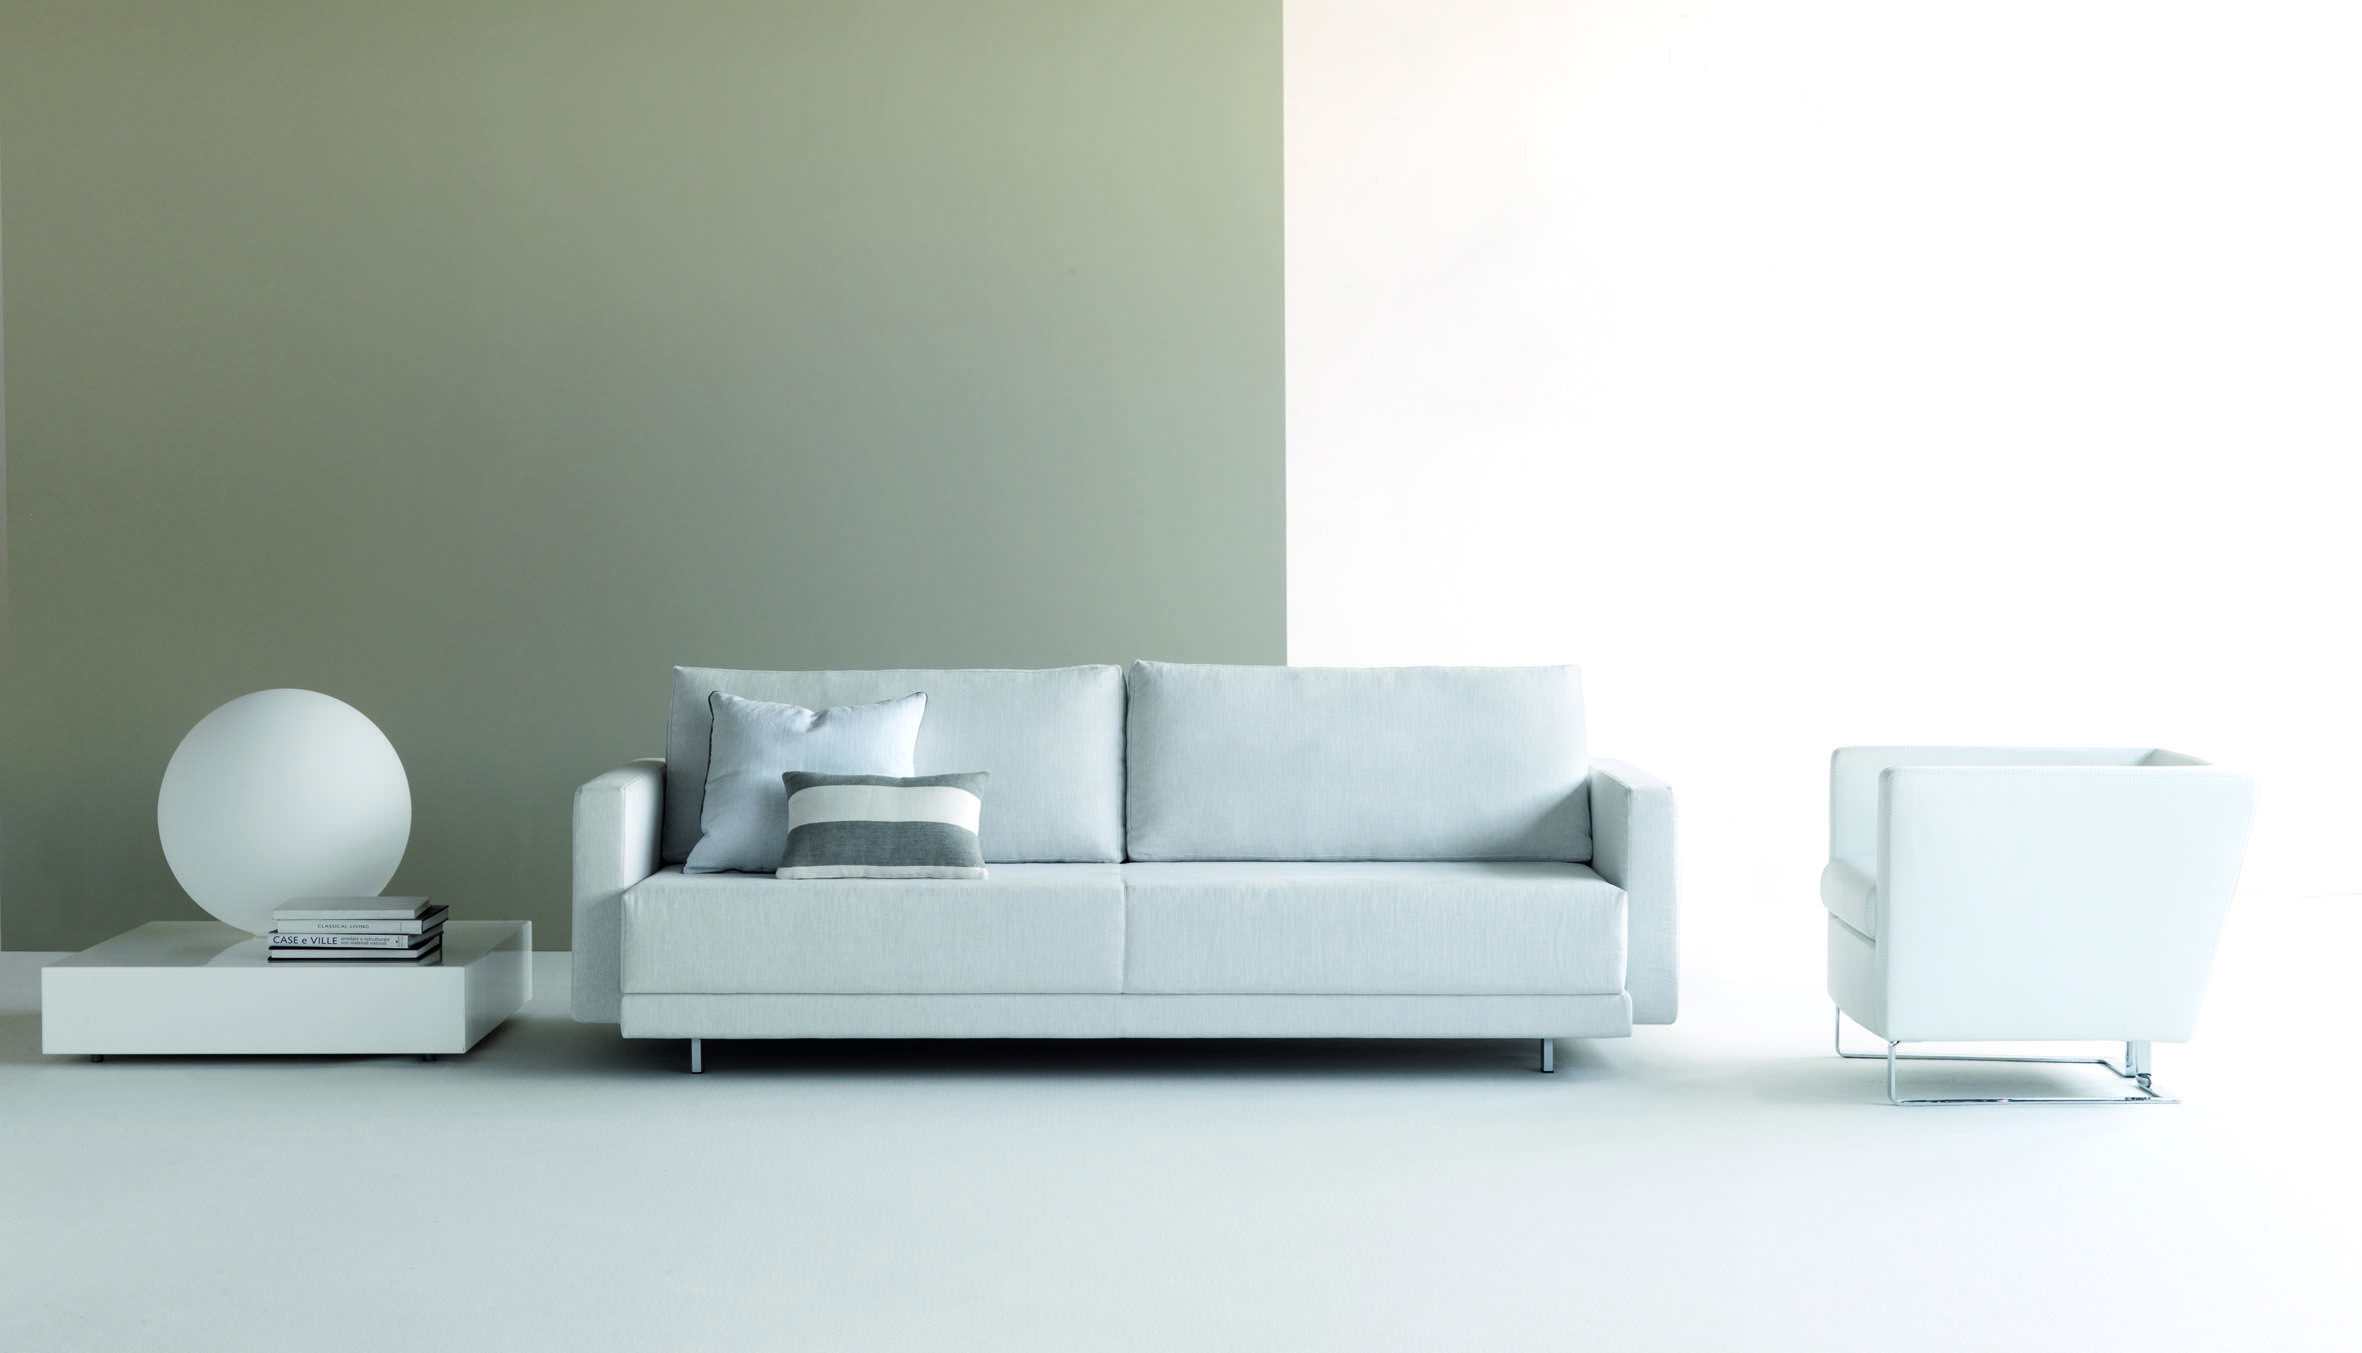 Bosal Arno Sofa bed & Chair Via Moretti Rosini UK